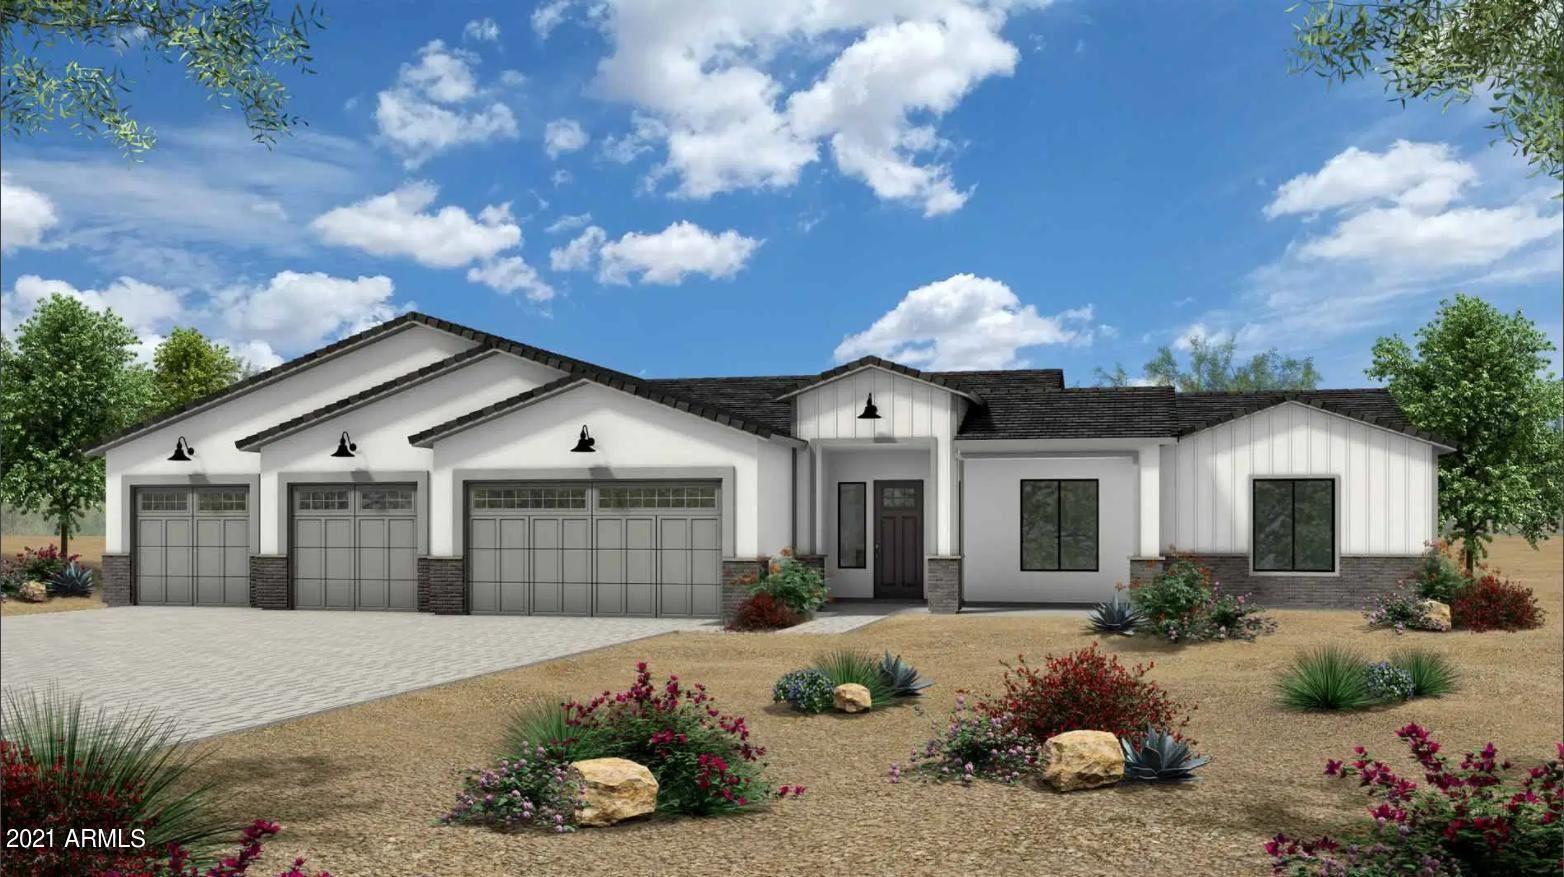 Photo of 0 N 13 Avenue #Lot 1, New River, AZ 85087 (MLS # 6249713)